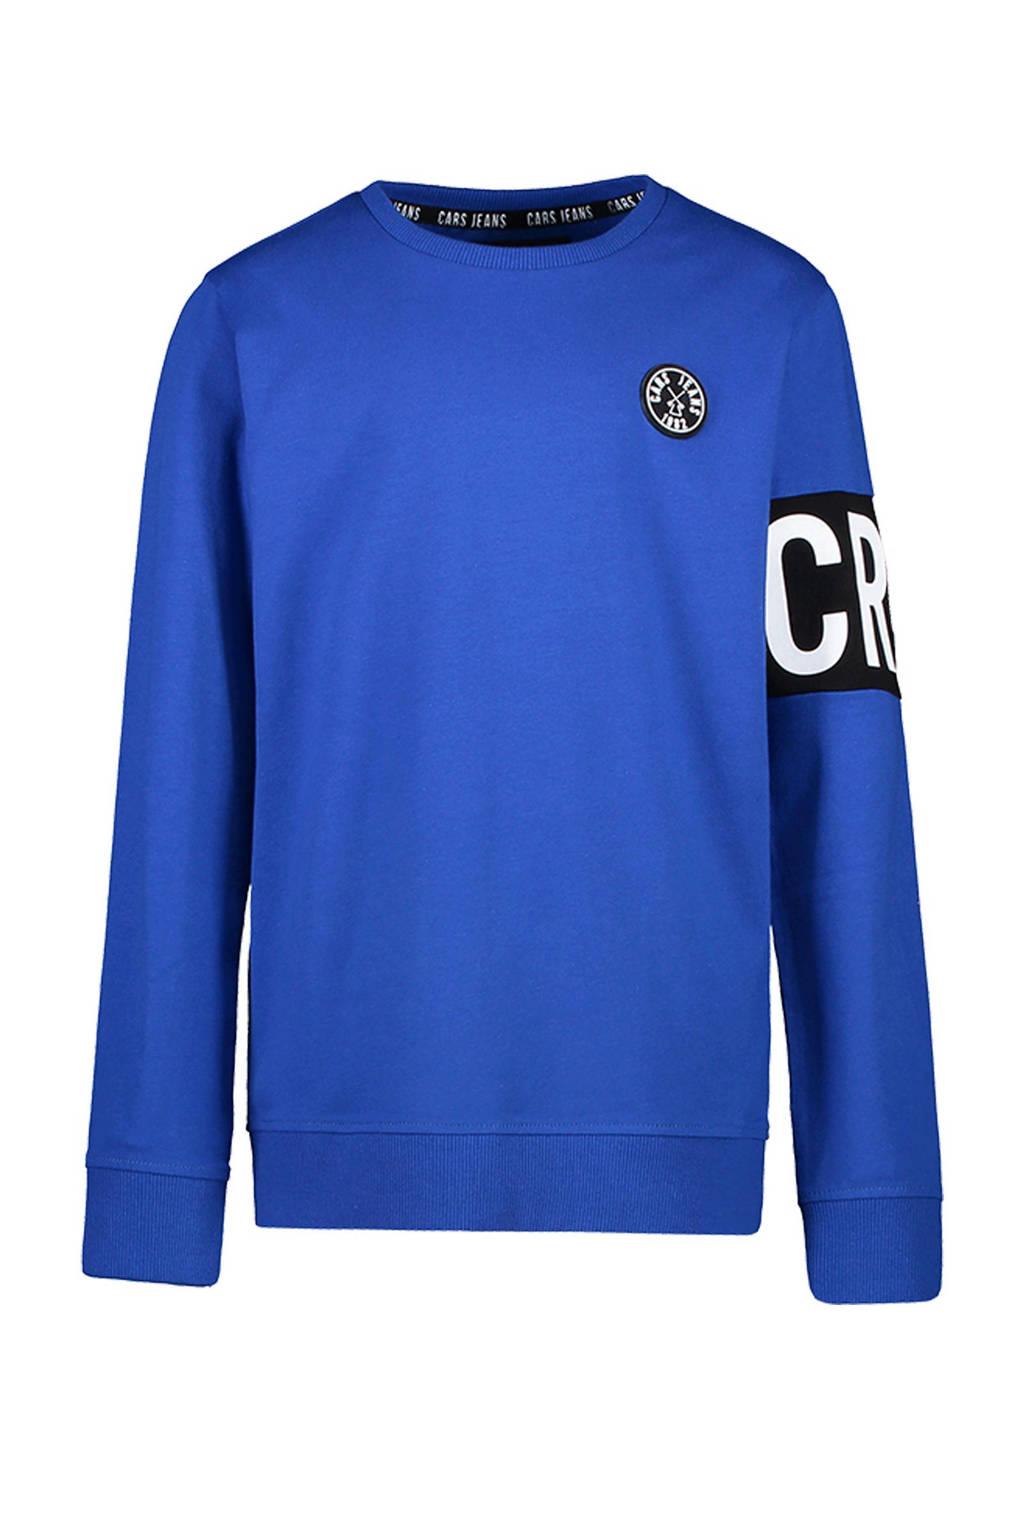 Cars sweater Obby met logo kobaltblauw, Kobaltblauw